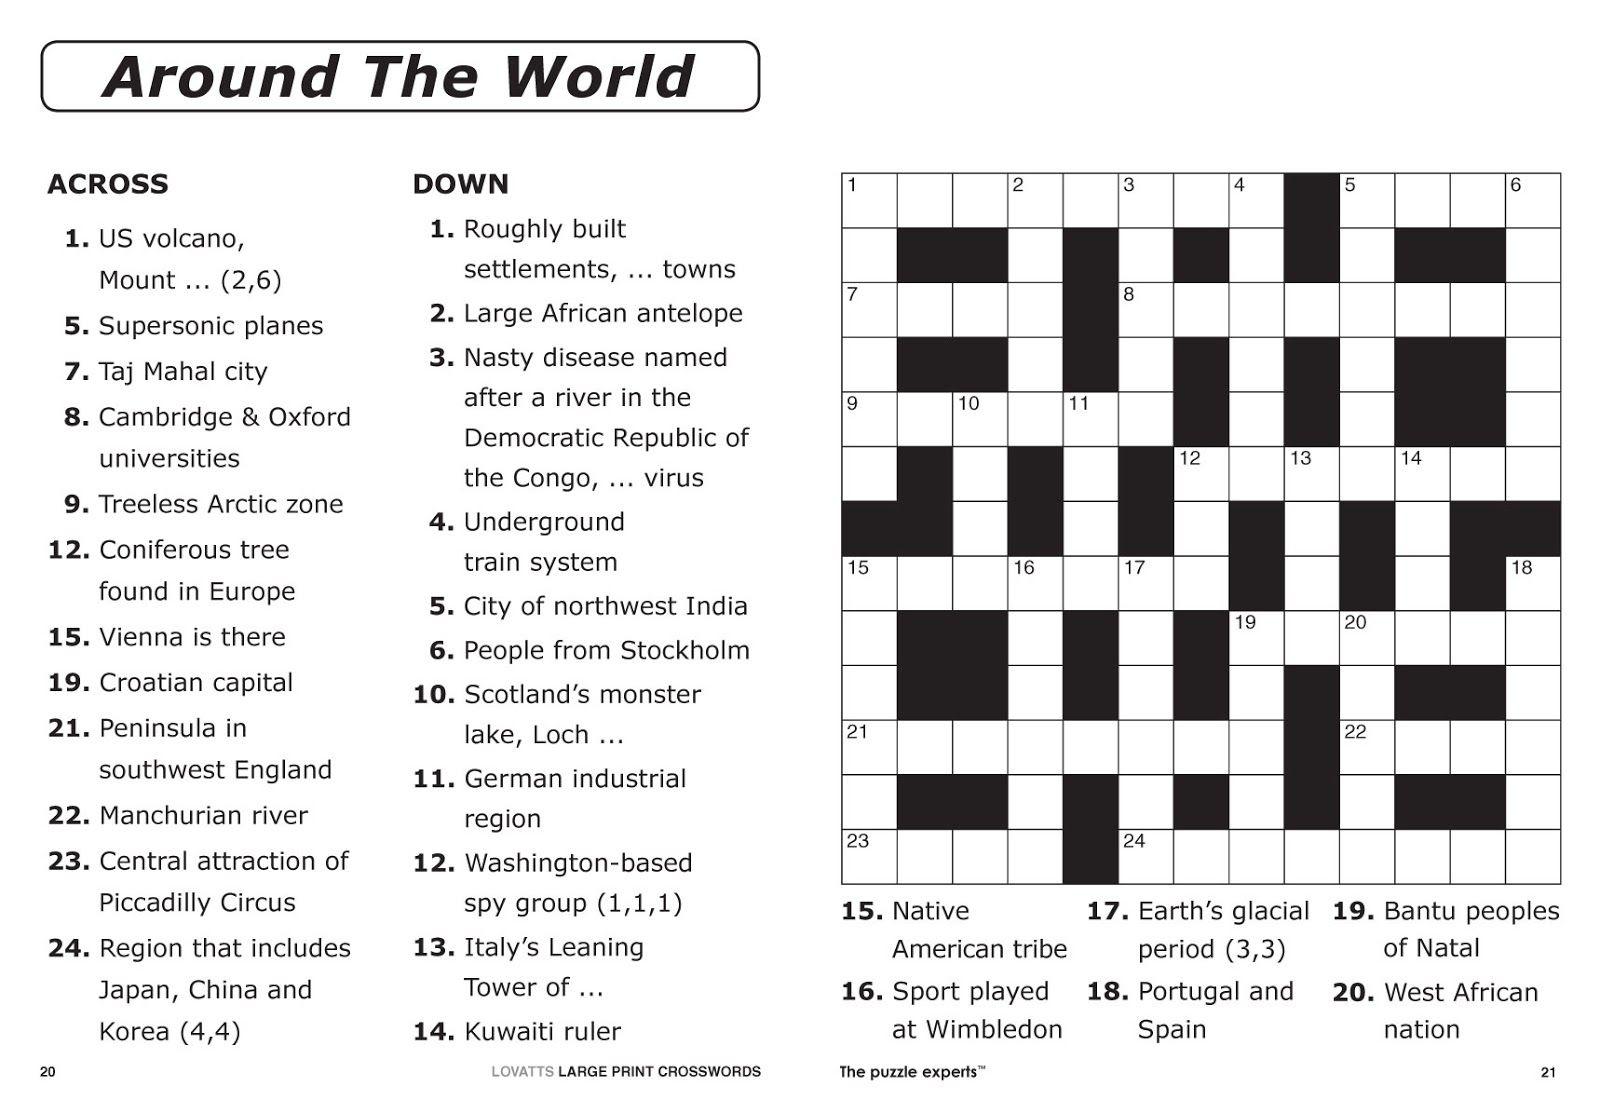 Free Printable Large Print Crossword Puzzles | M3U8 - Printable Crossword Puzzle With Answer Key